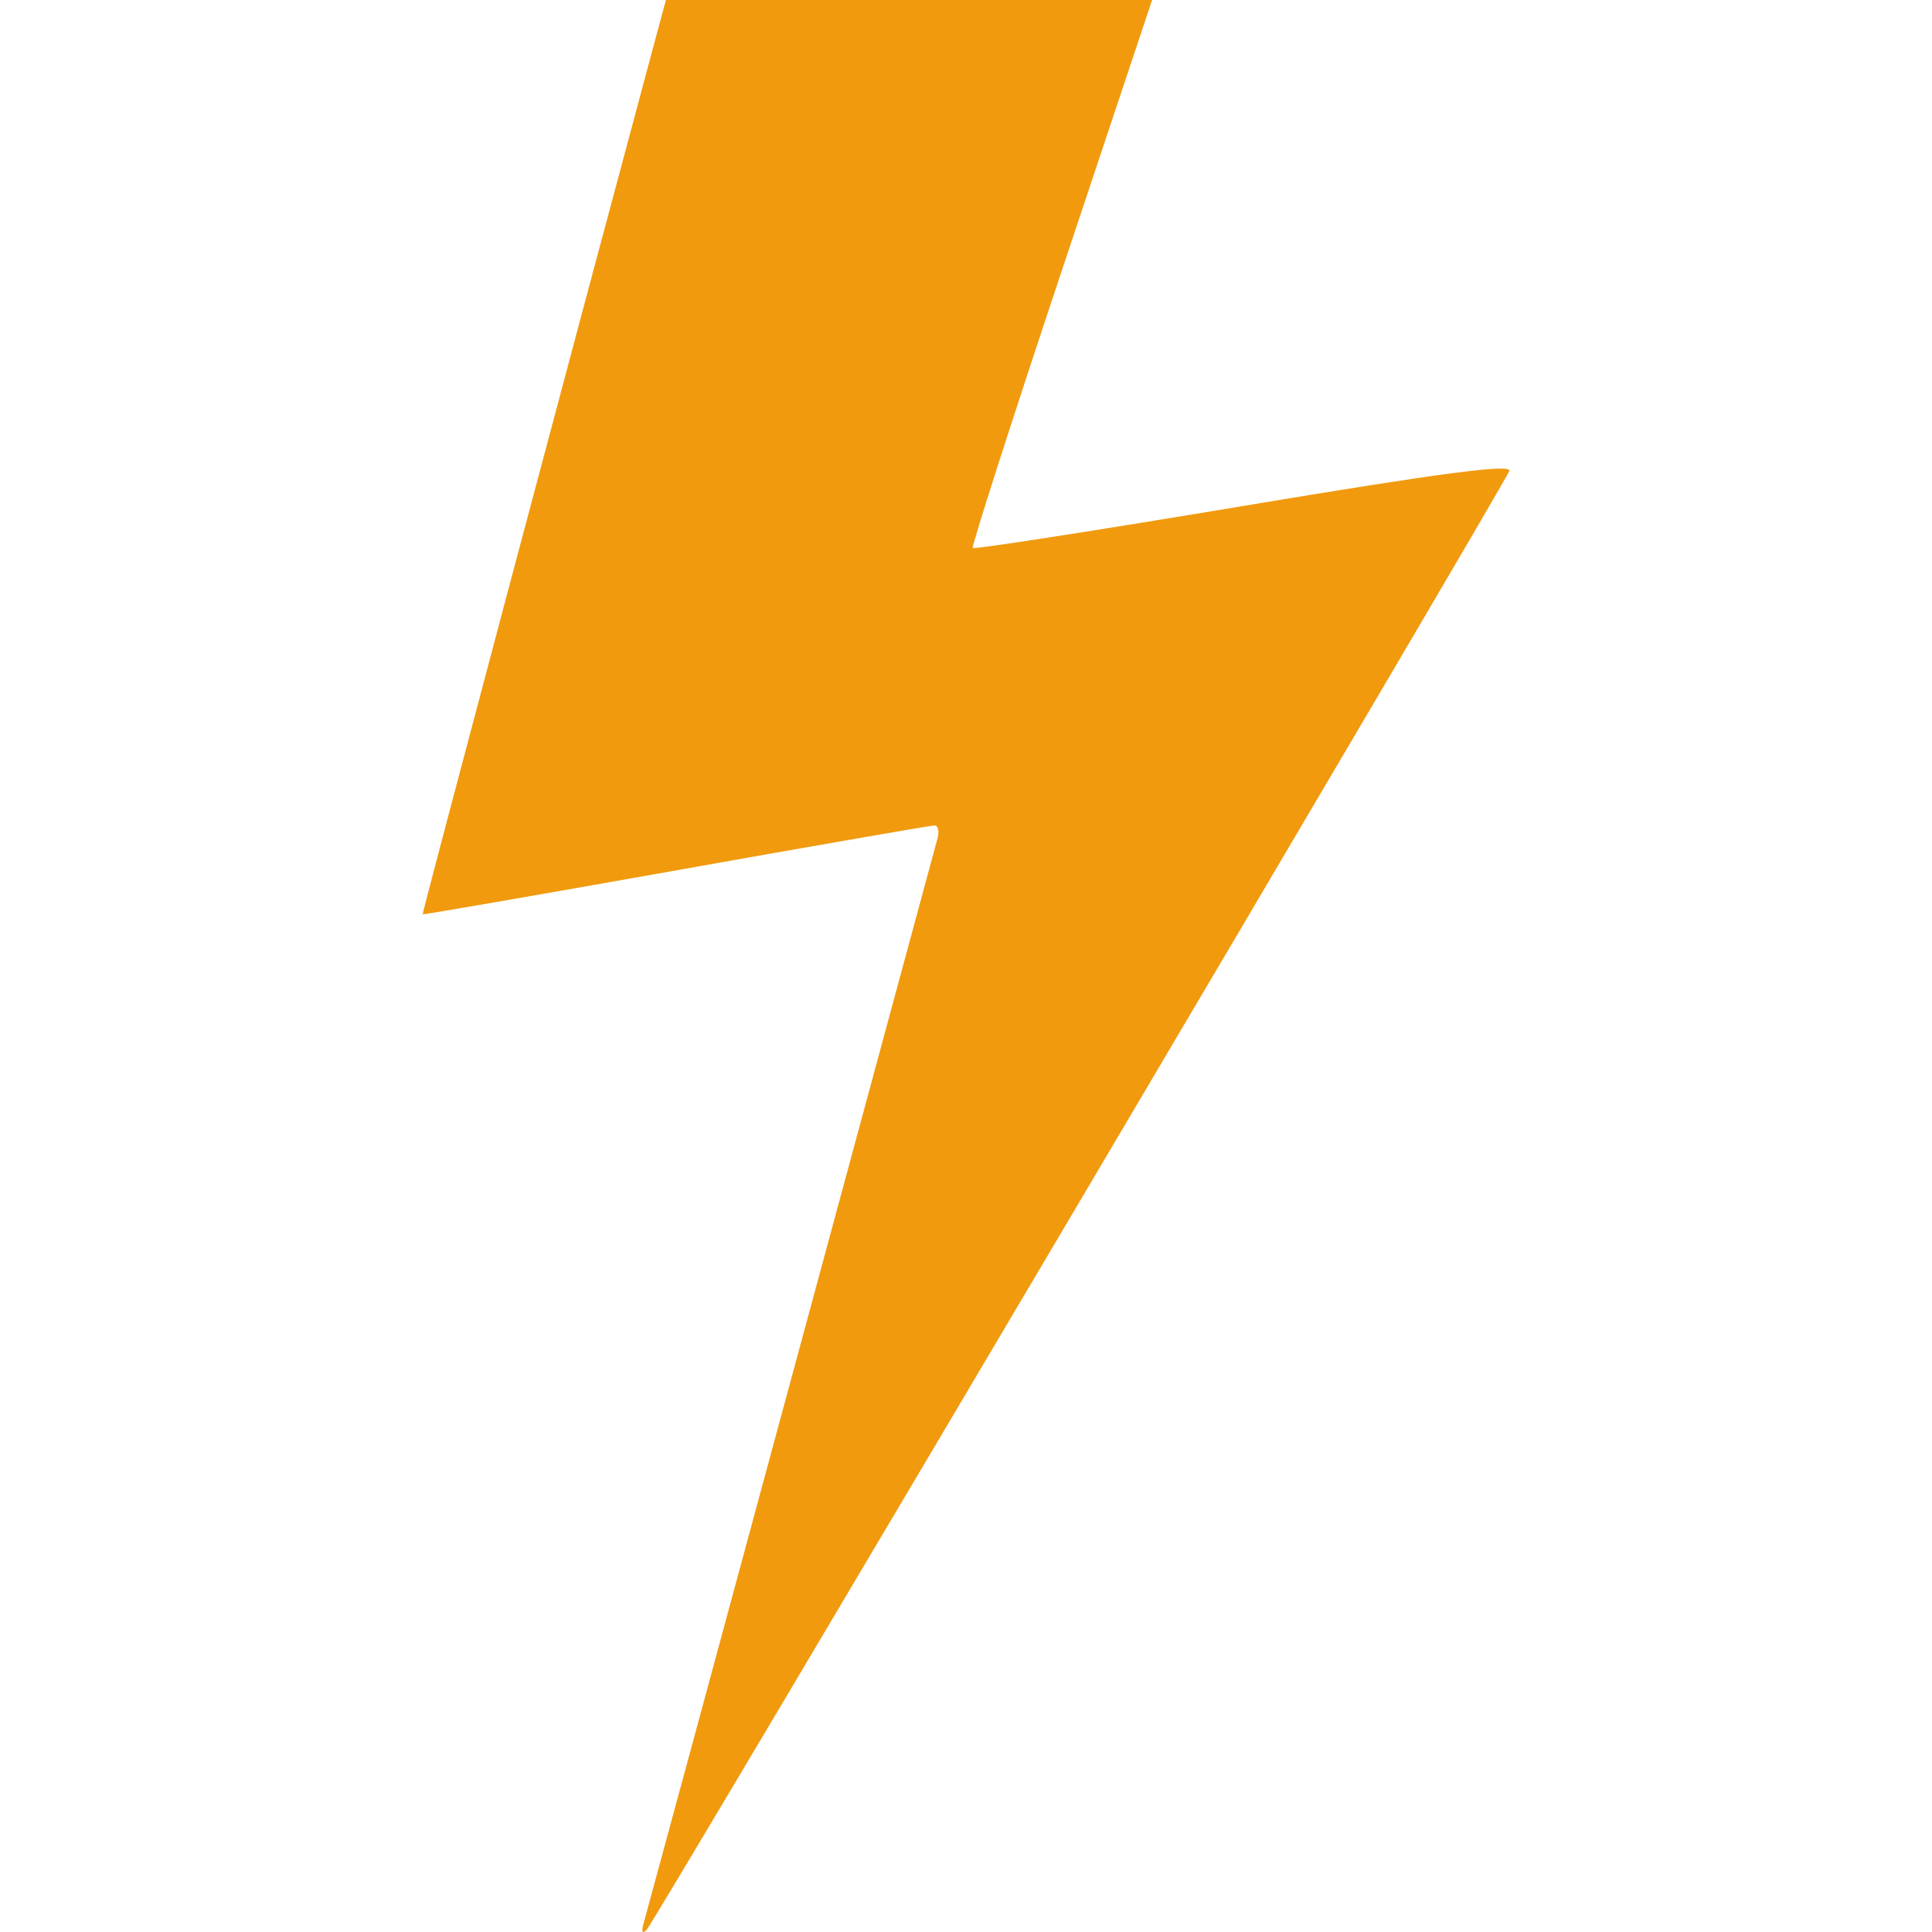 Lightning bolt icon.png